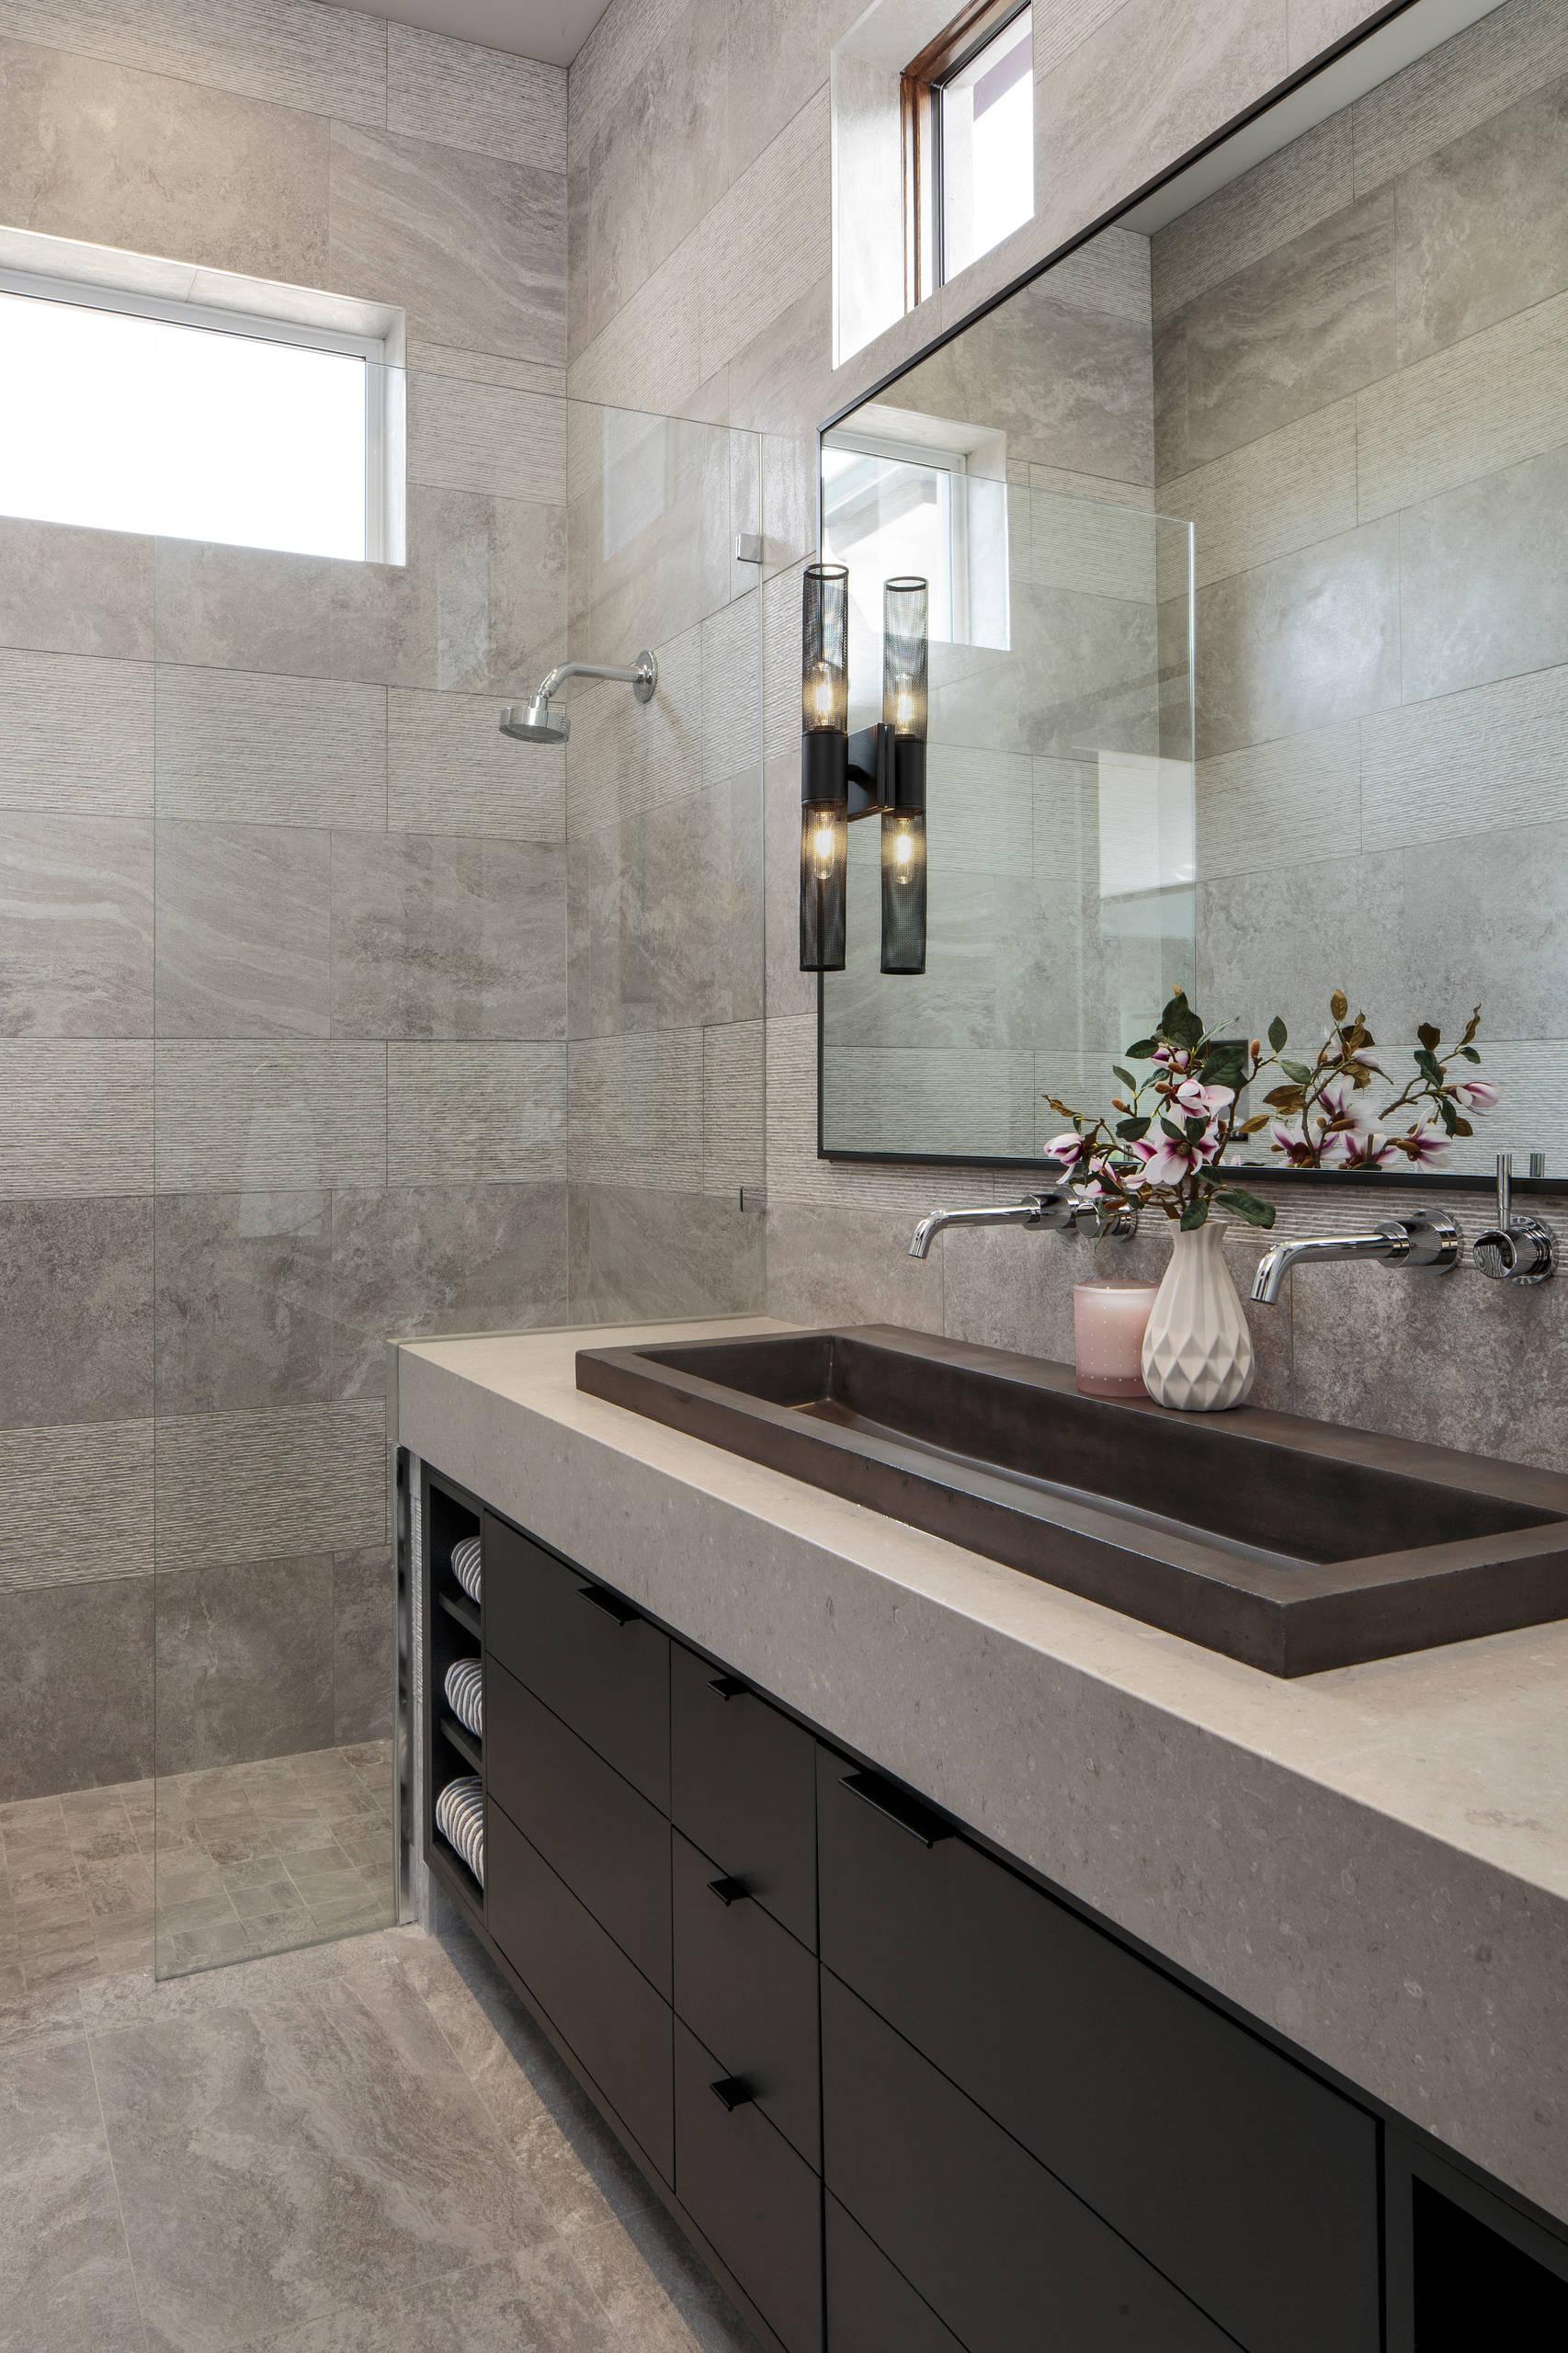 75 Beautiful Modern Bathroom Pictures Ideas November 2020 Houzz